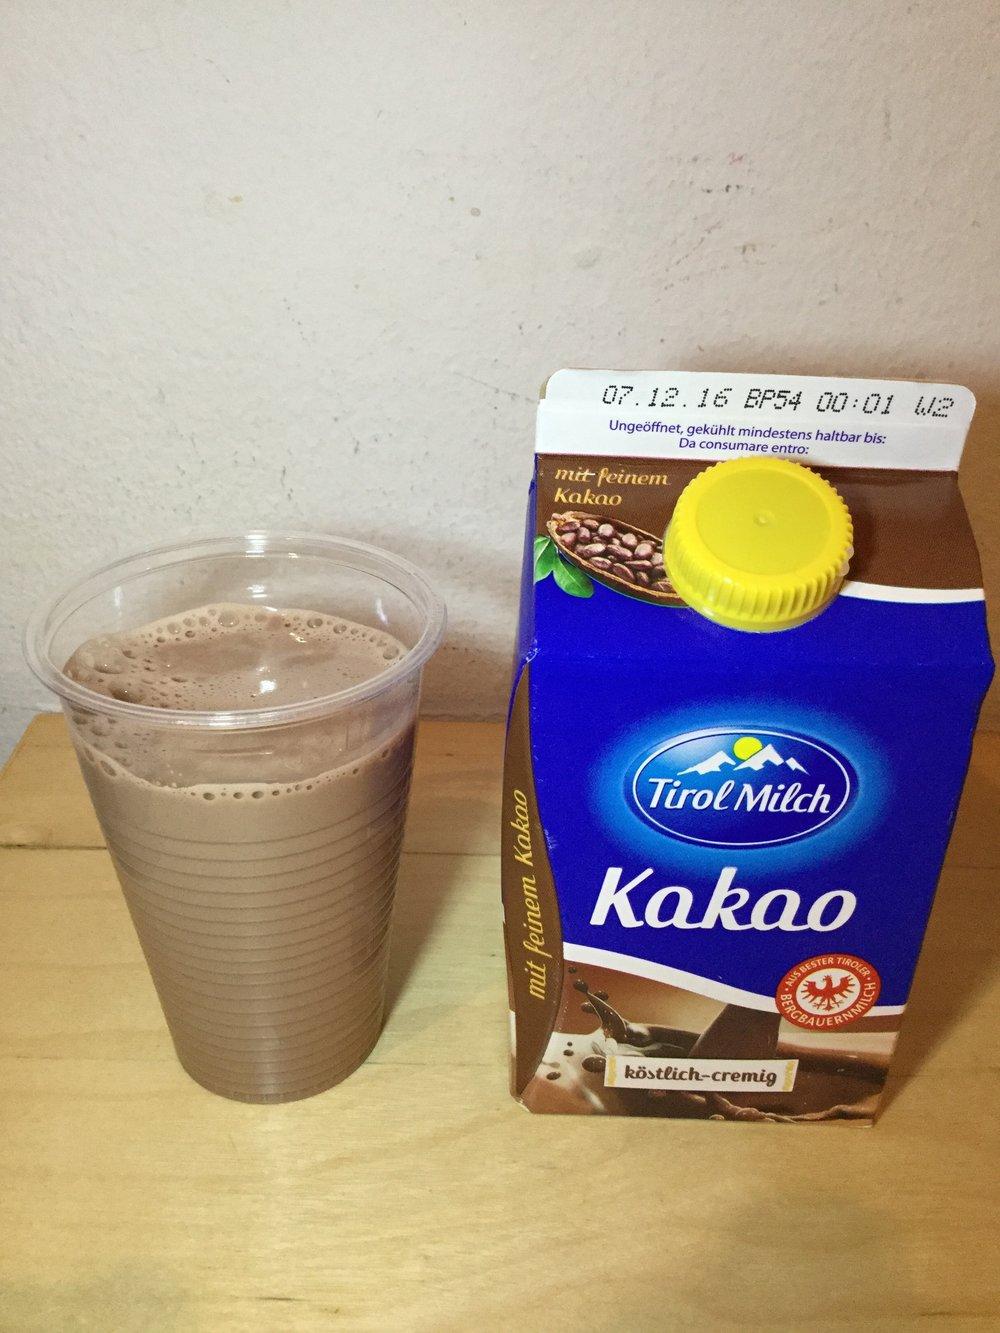 Tirol Milch Kakao Cup